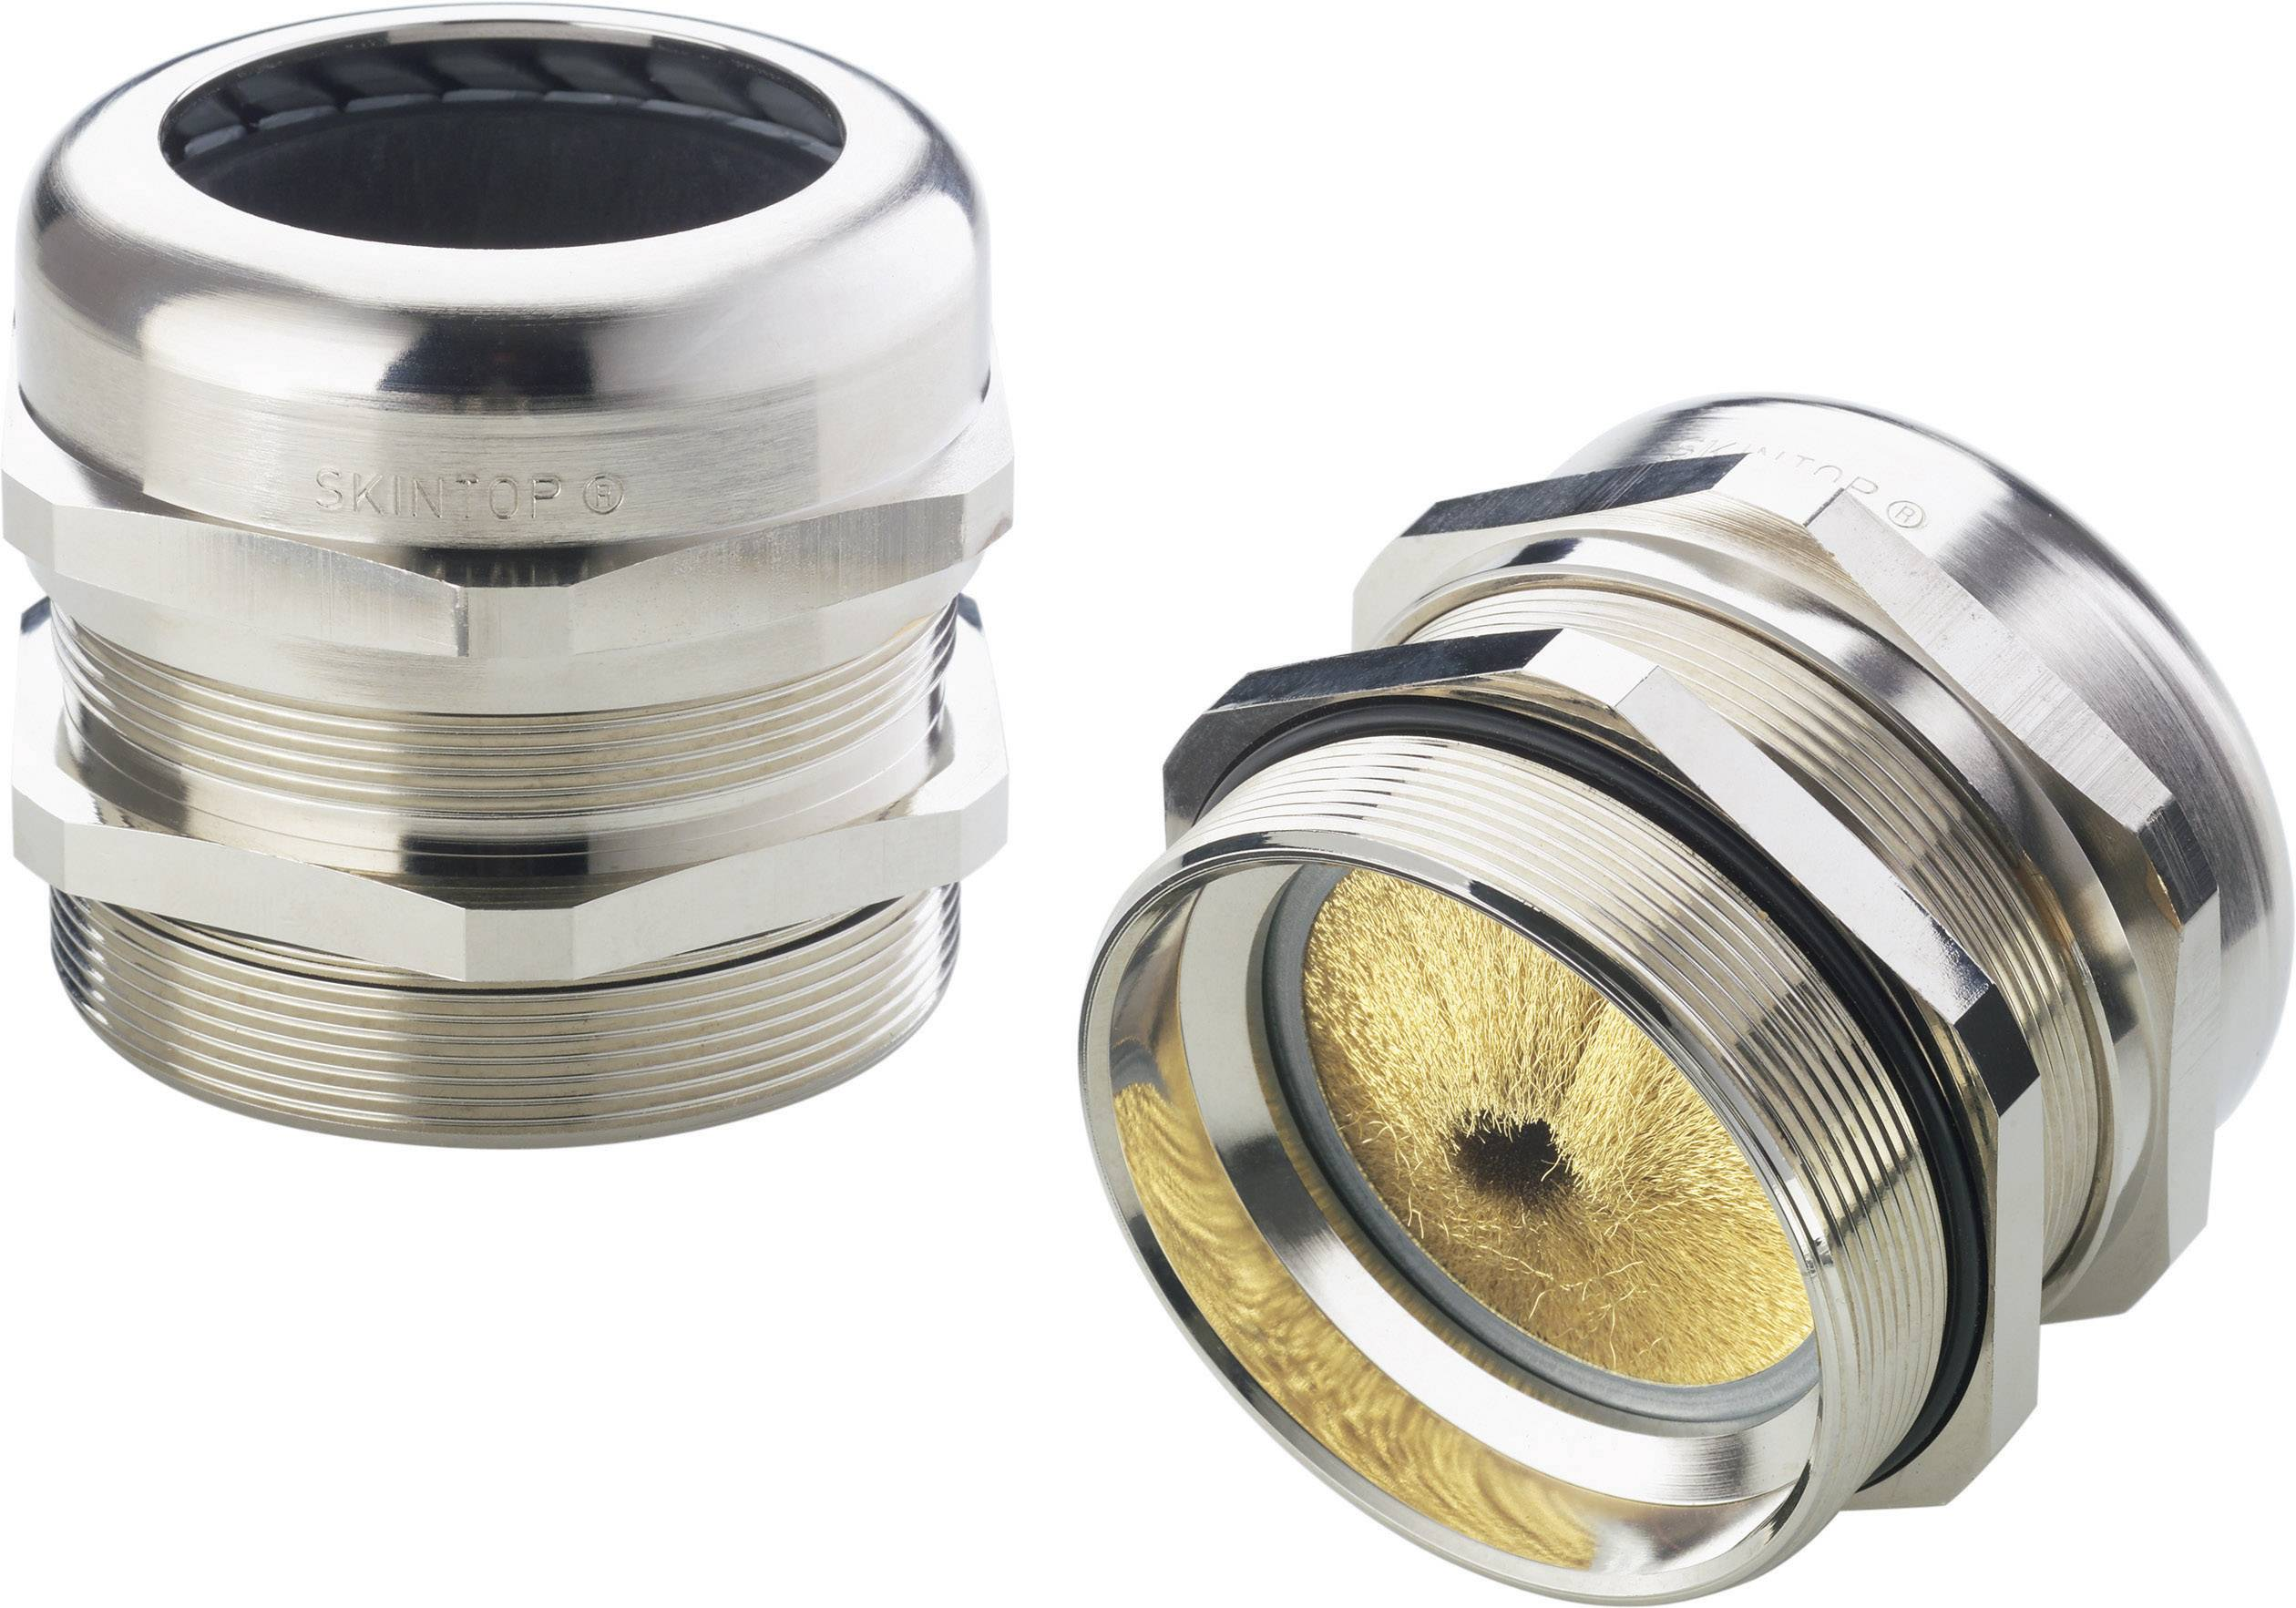 Káblová priechodka LappKabel SKINTOP® MS-M BRUSH 63x1,5 plus, mosadz, mosadz, 1 ks